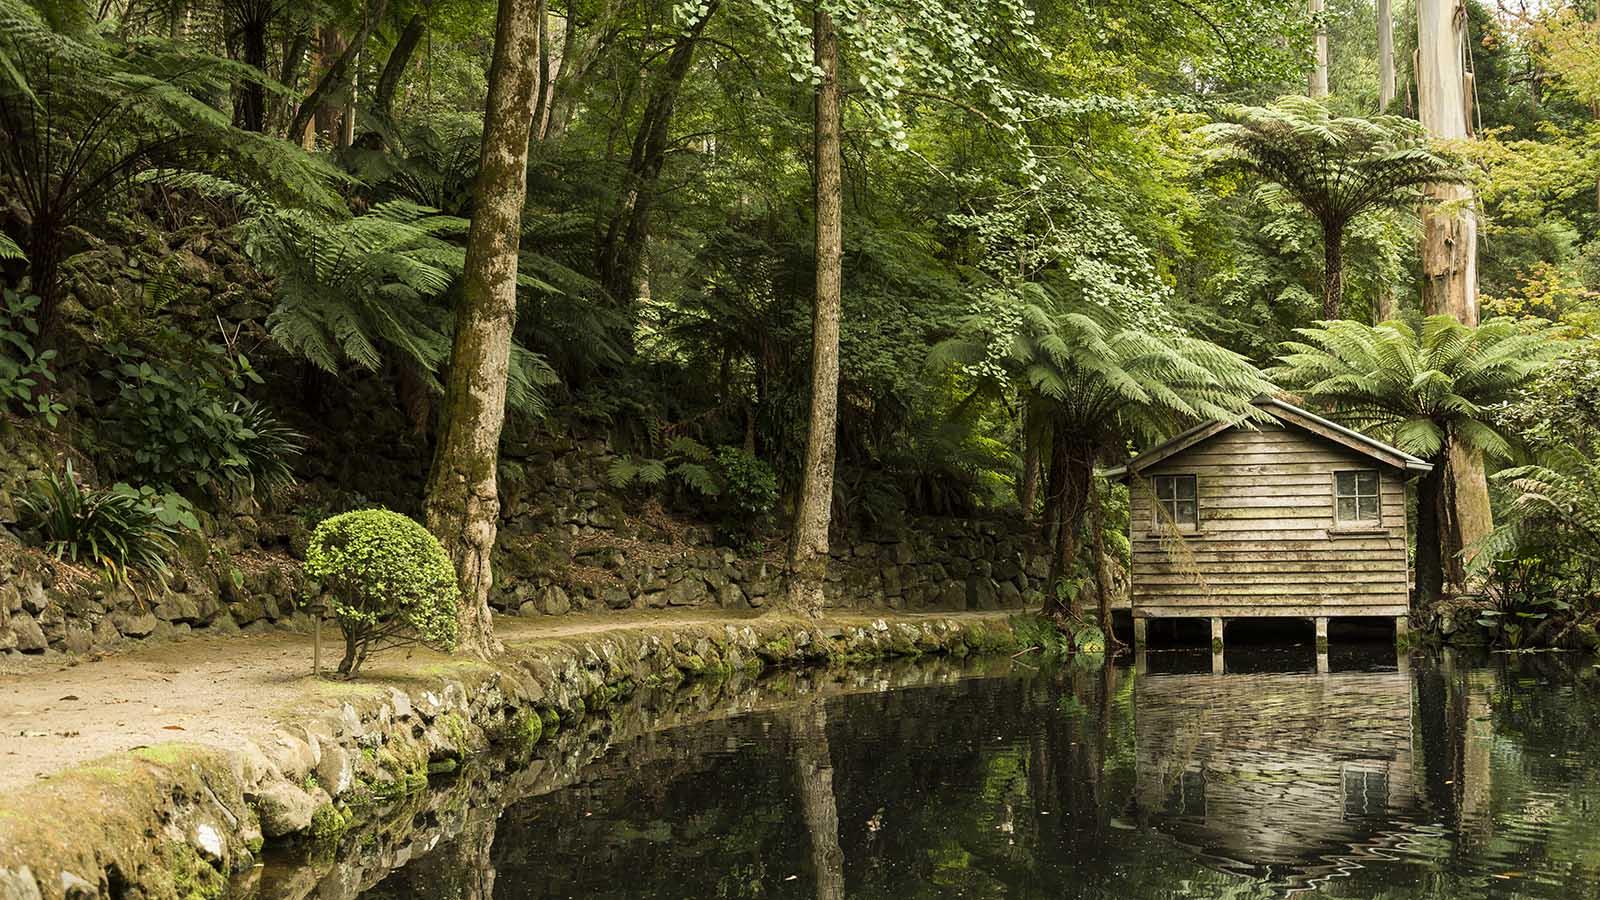 Alfred Nicholas Gardens, Yarra Valley & Dandenong Ranges, Victoria, Australia